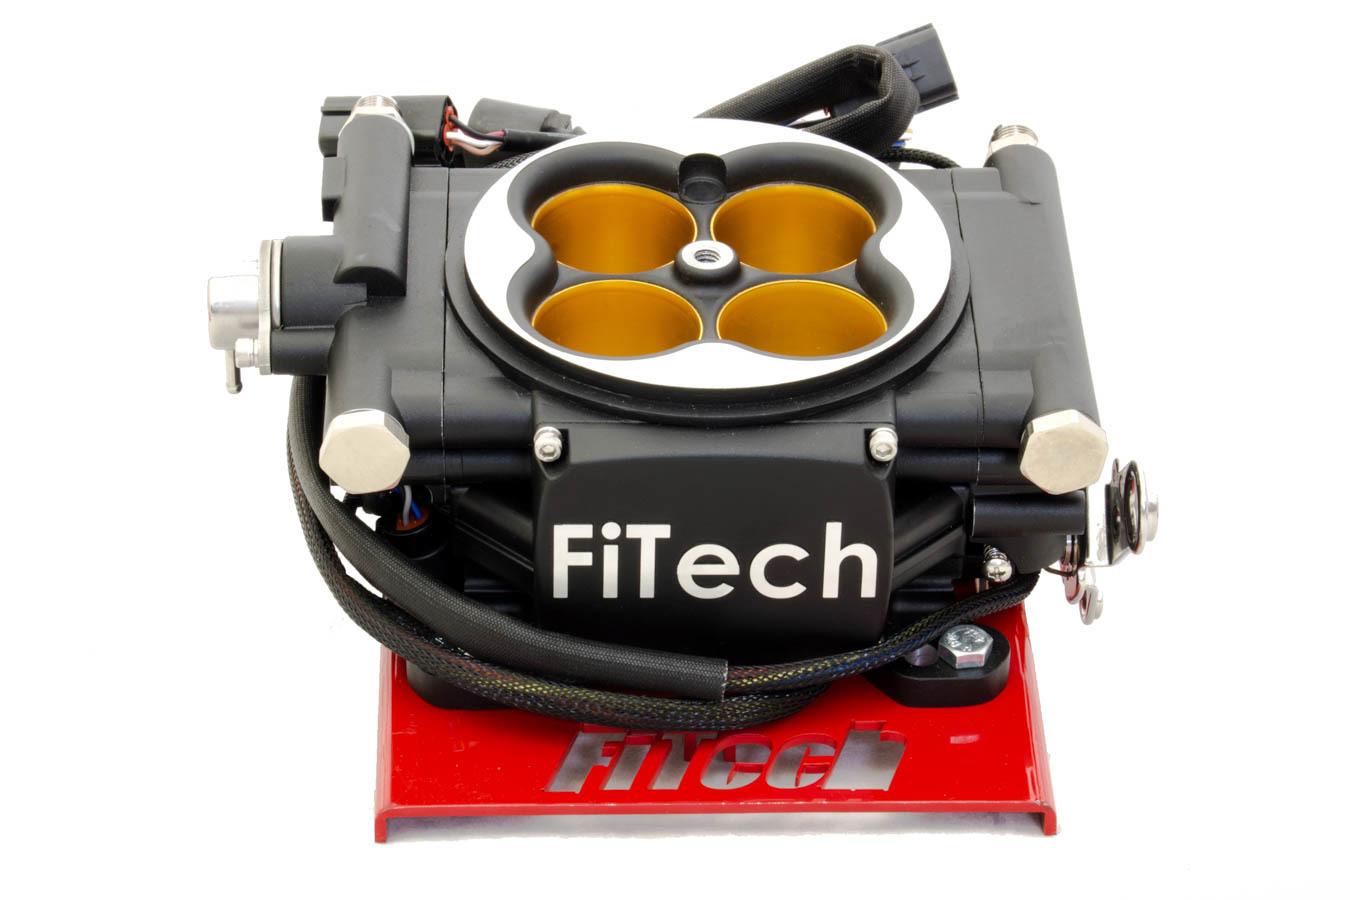 Fitech Fuel Injection 30012 Fuel Injection, Go EFI 8 Power Adder, Throttle Body, Square Bore, 70 lb/hr Injectors, Nitrous Control, Aluminum, Black Anodize, Universal, Kit